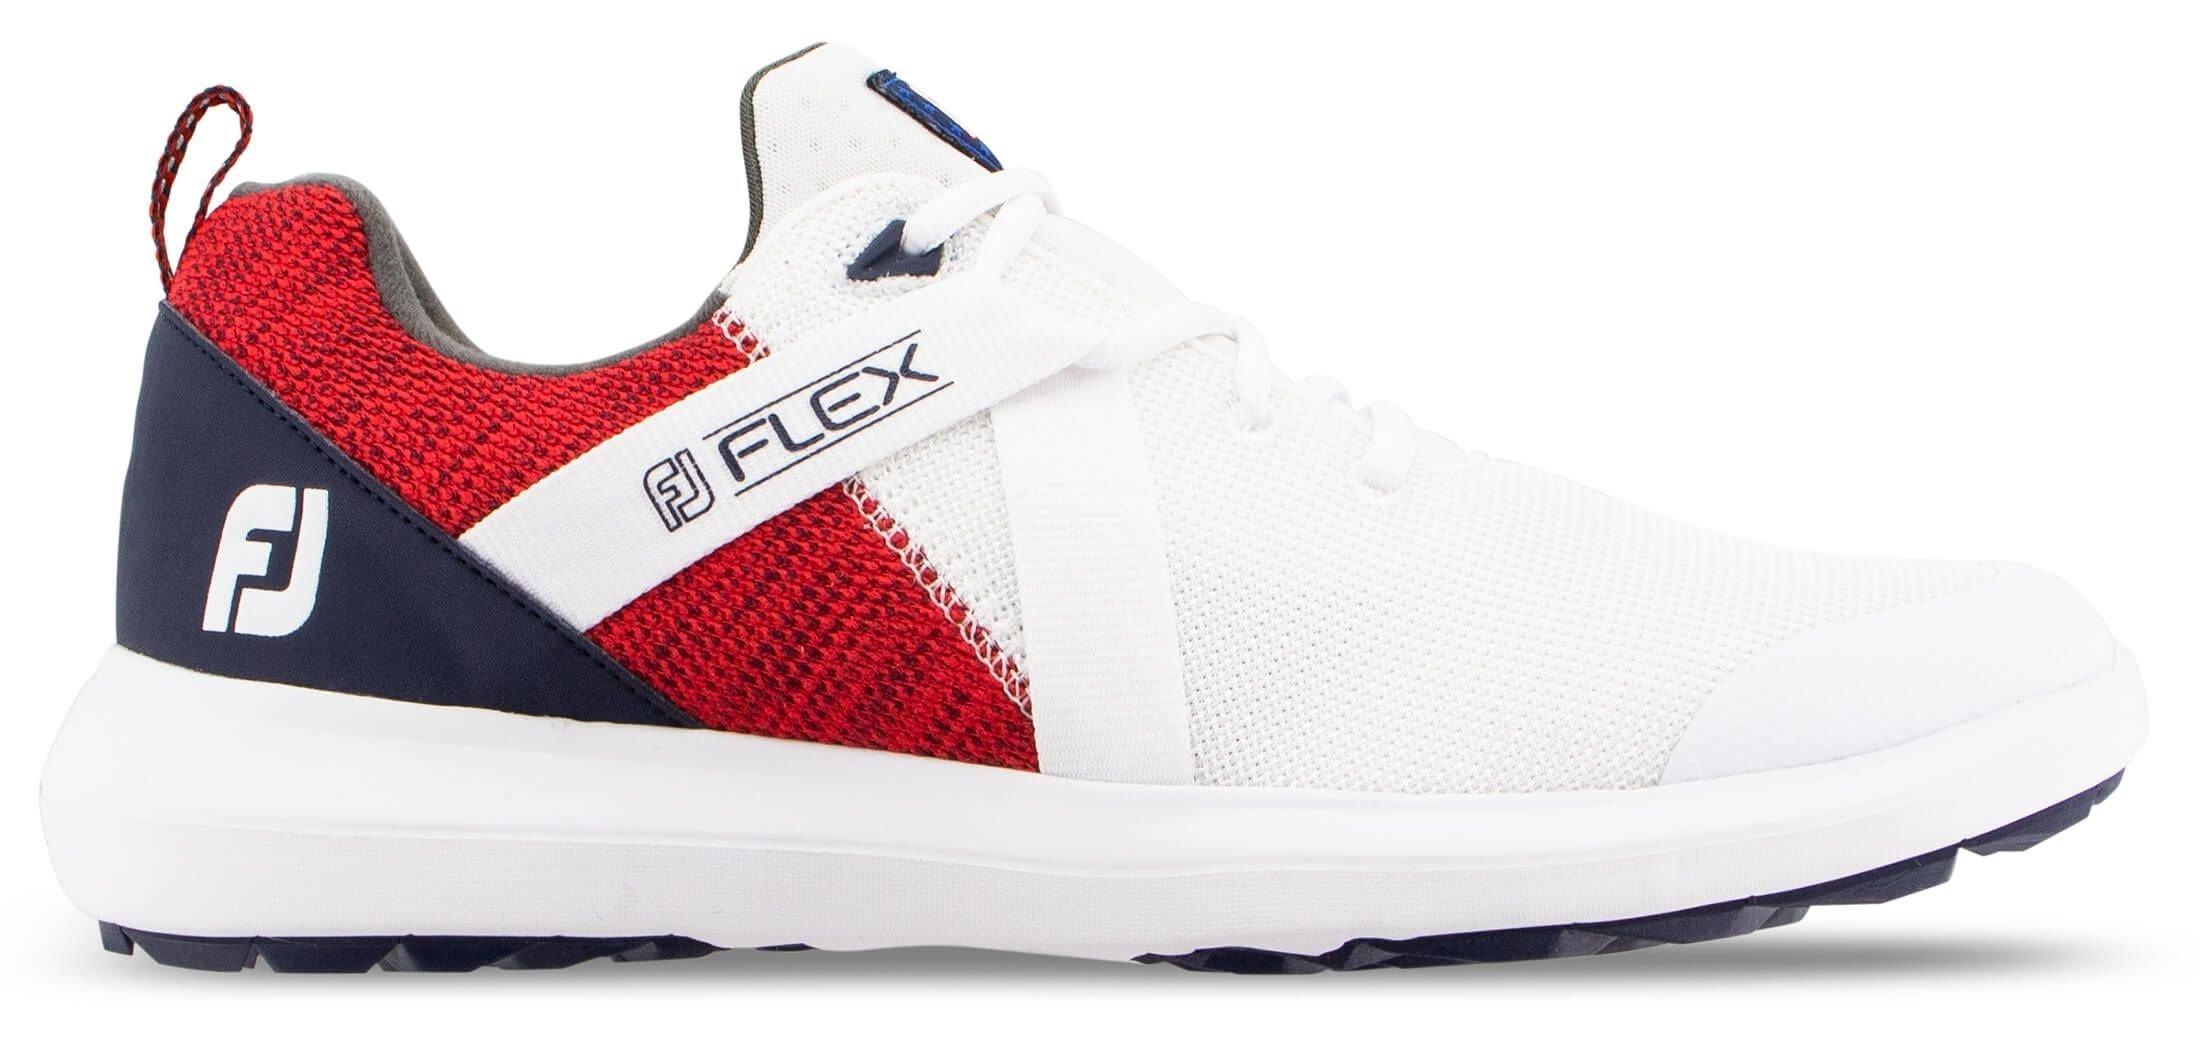 FootJoy Flex Golf Shoes - Red/White/Blue 56104